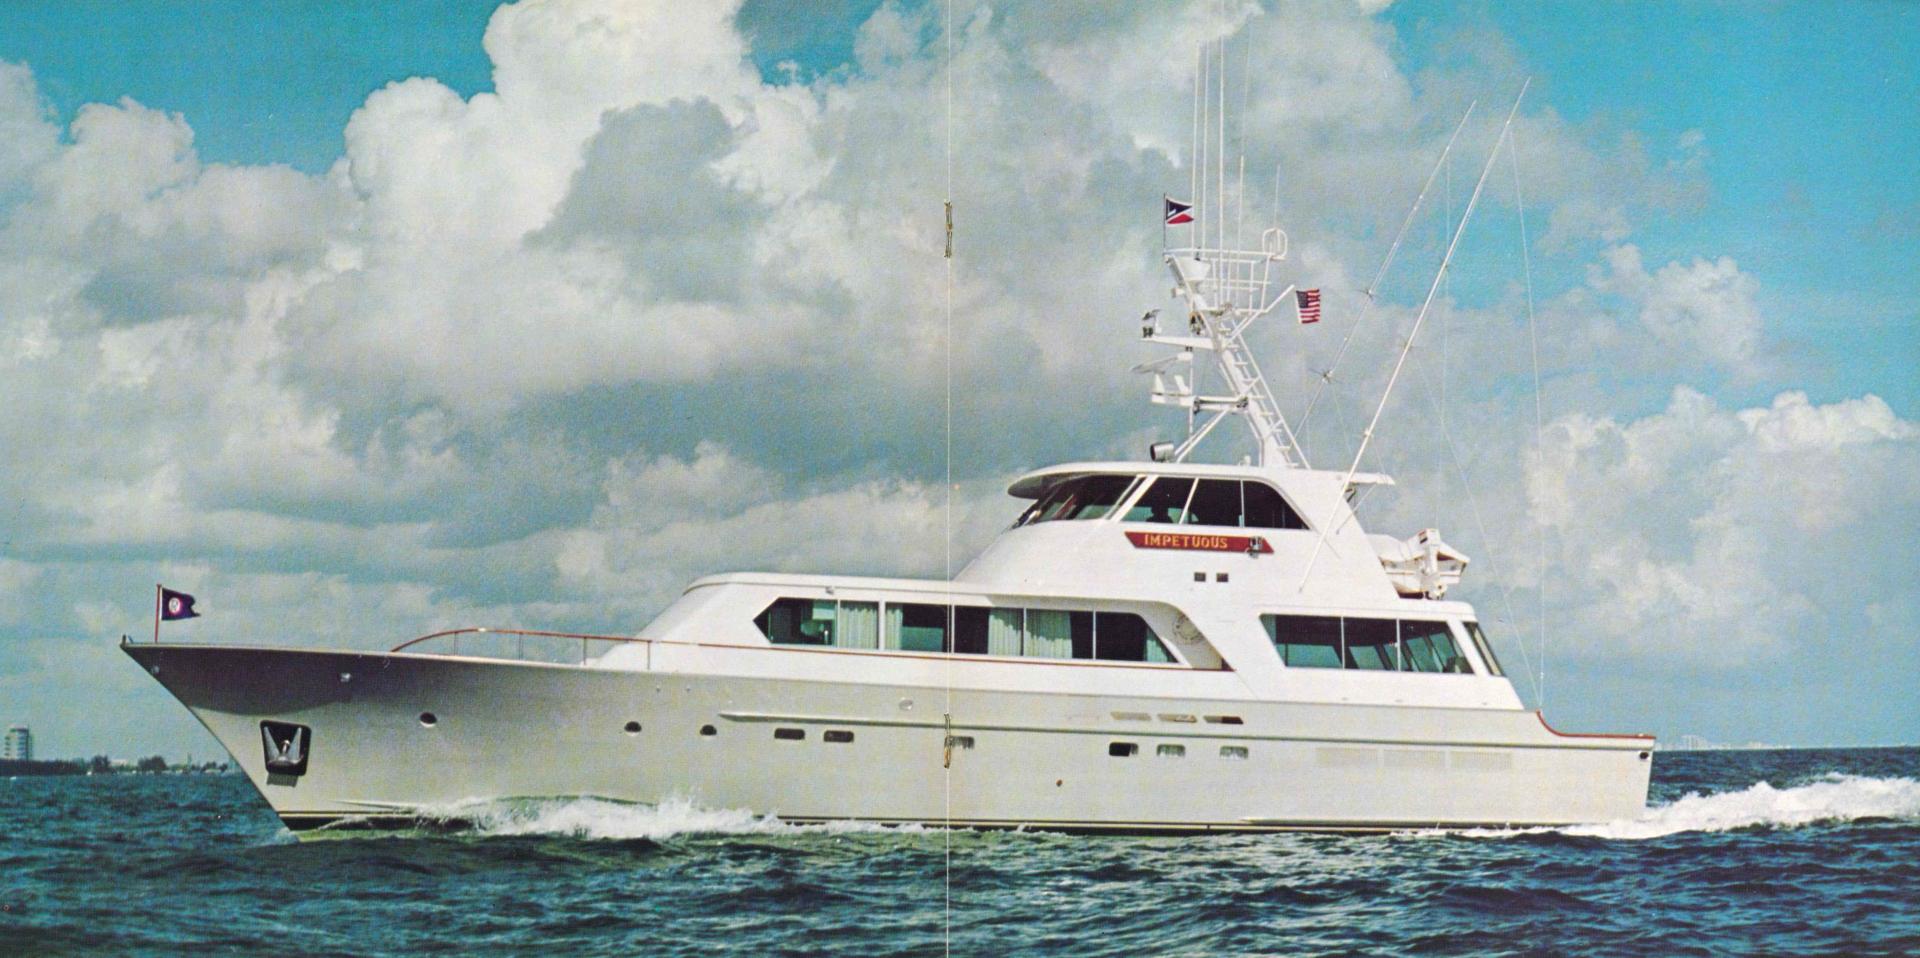 Feadship-Yacht Fisherman 1977-Impetuous Fort Lauderdale-Florida-United States-1575391 | Thumbnail